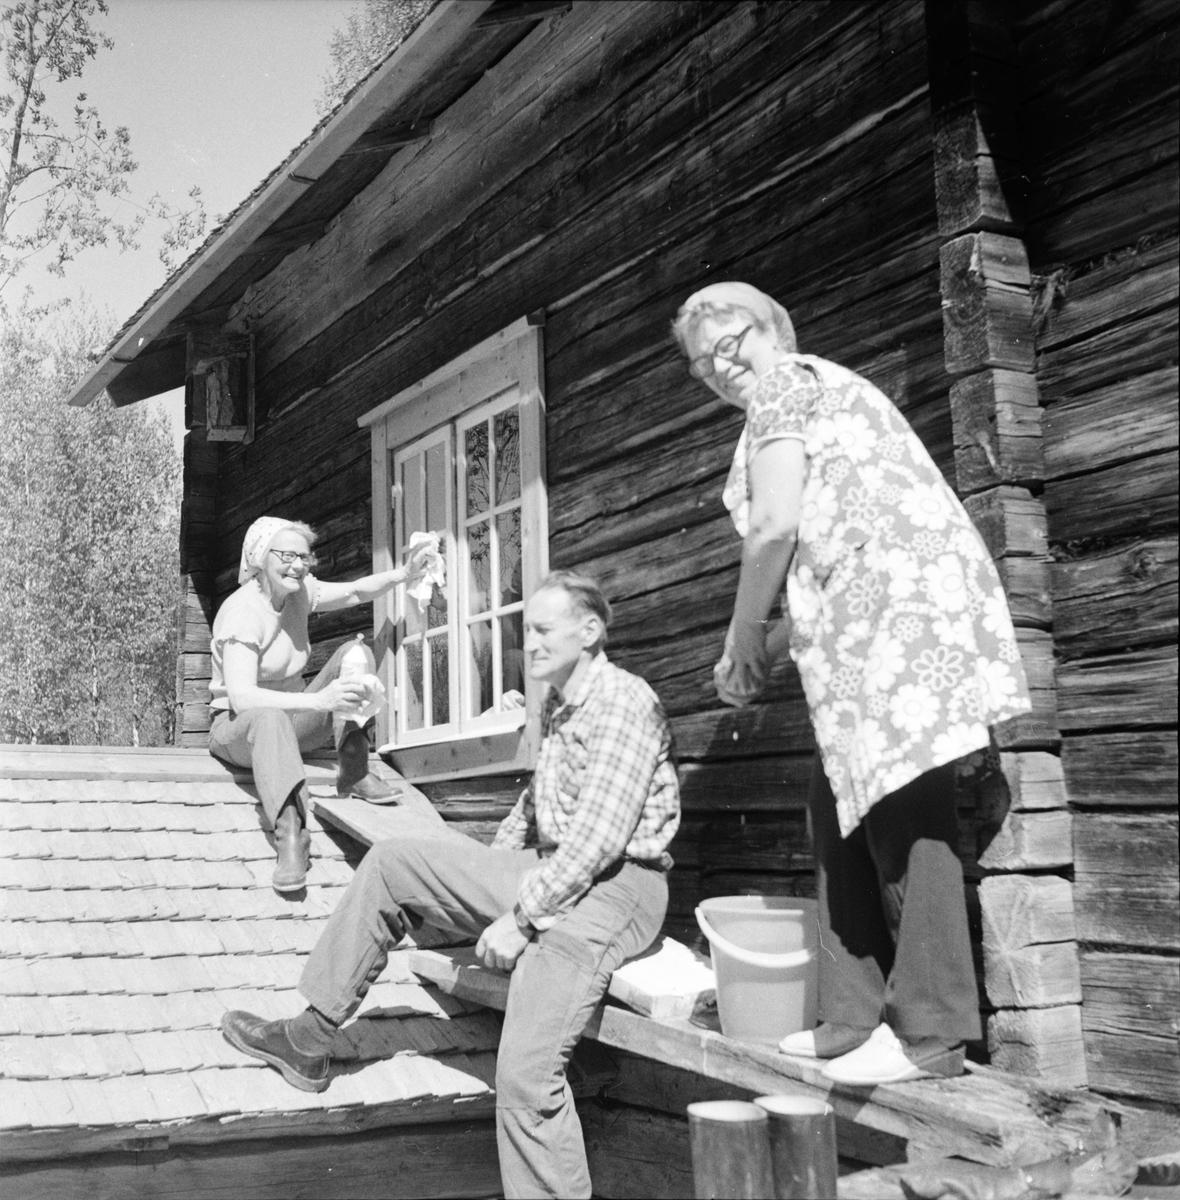 Dalsjön, Städning och röjning, Maj 1973